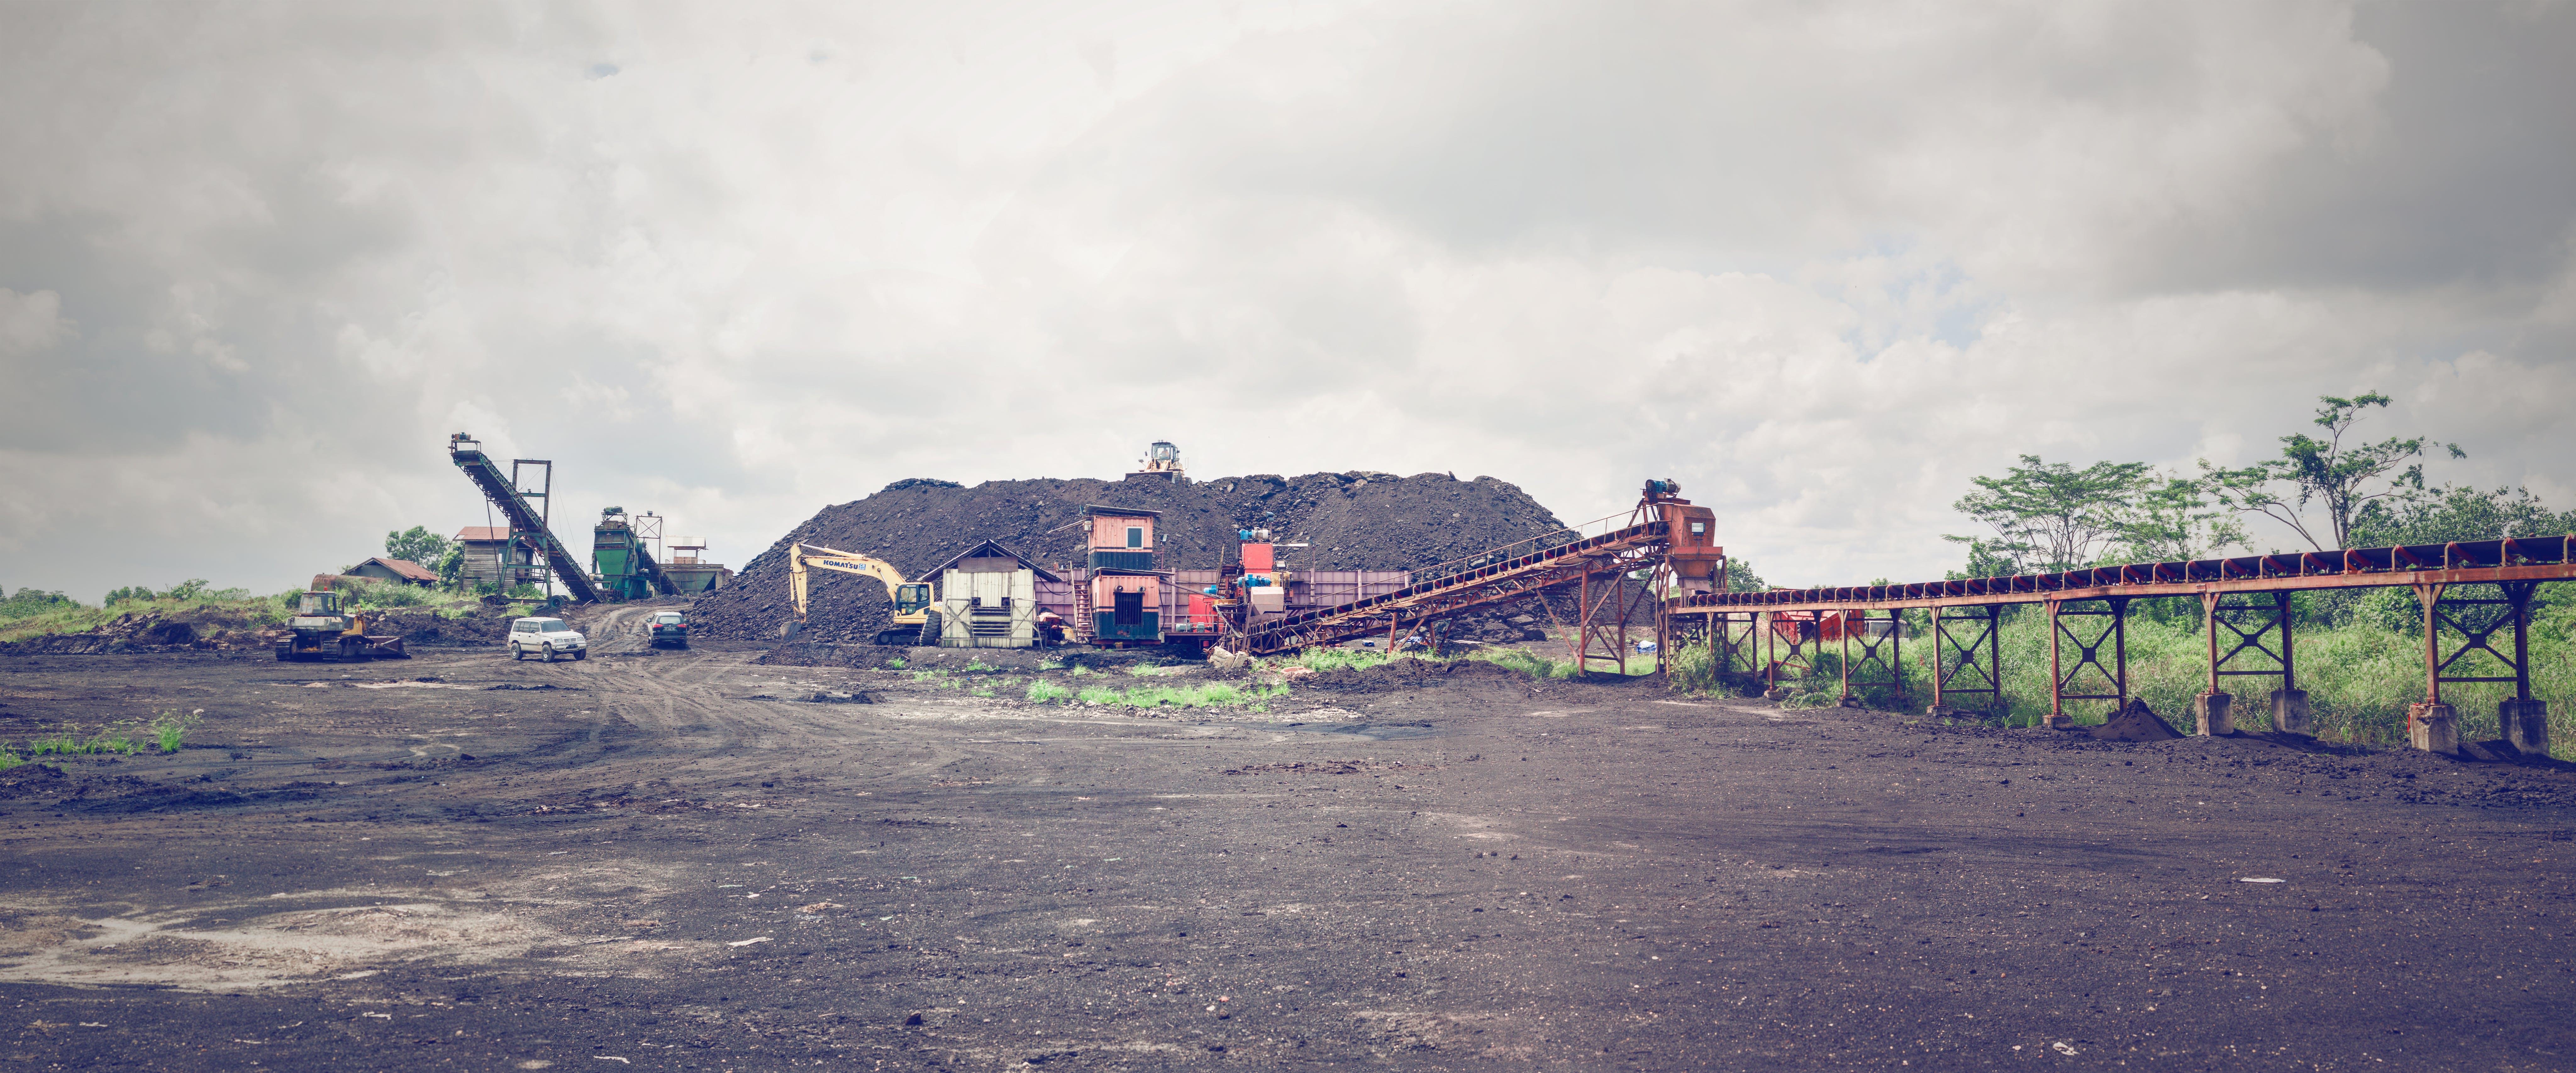 Free stock photo of brown coal, coal, coal mining, conveyor